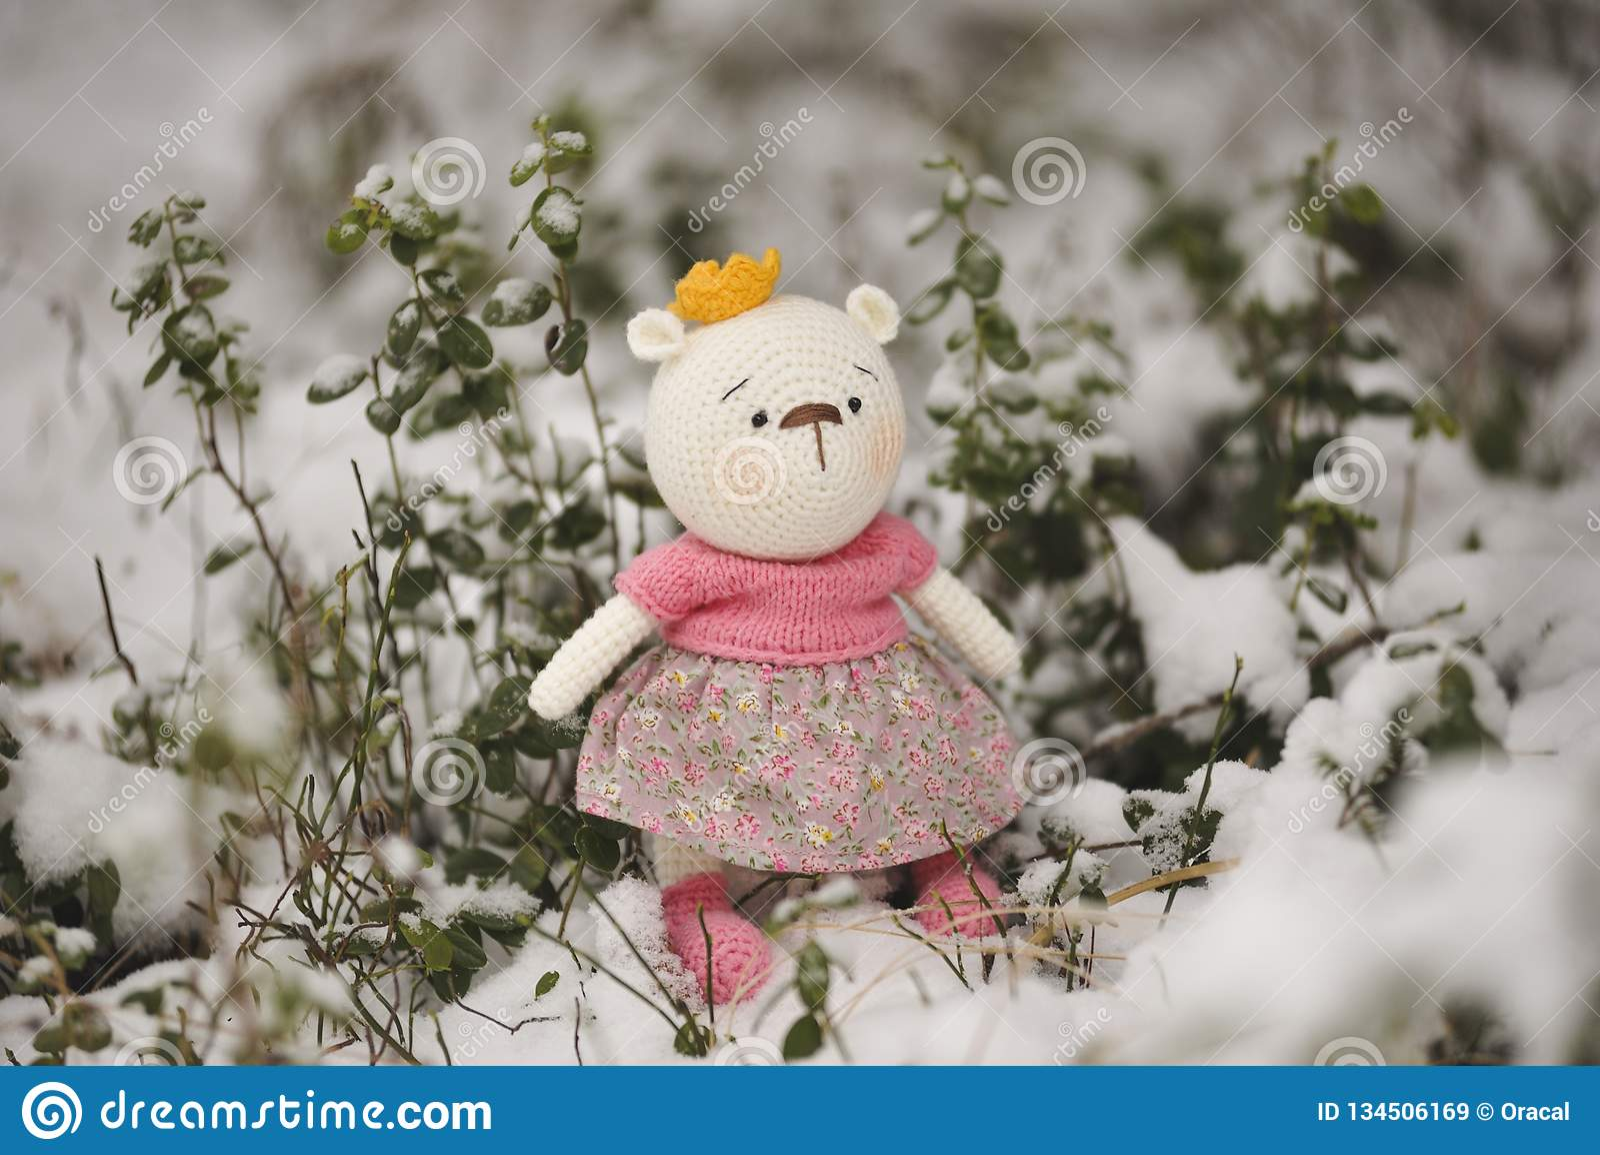 Amazon.com: Child's Crocheted Stuffed Amigurumi Toy Animal Plush ...   1154x1600